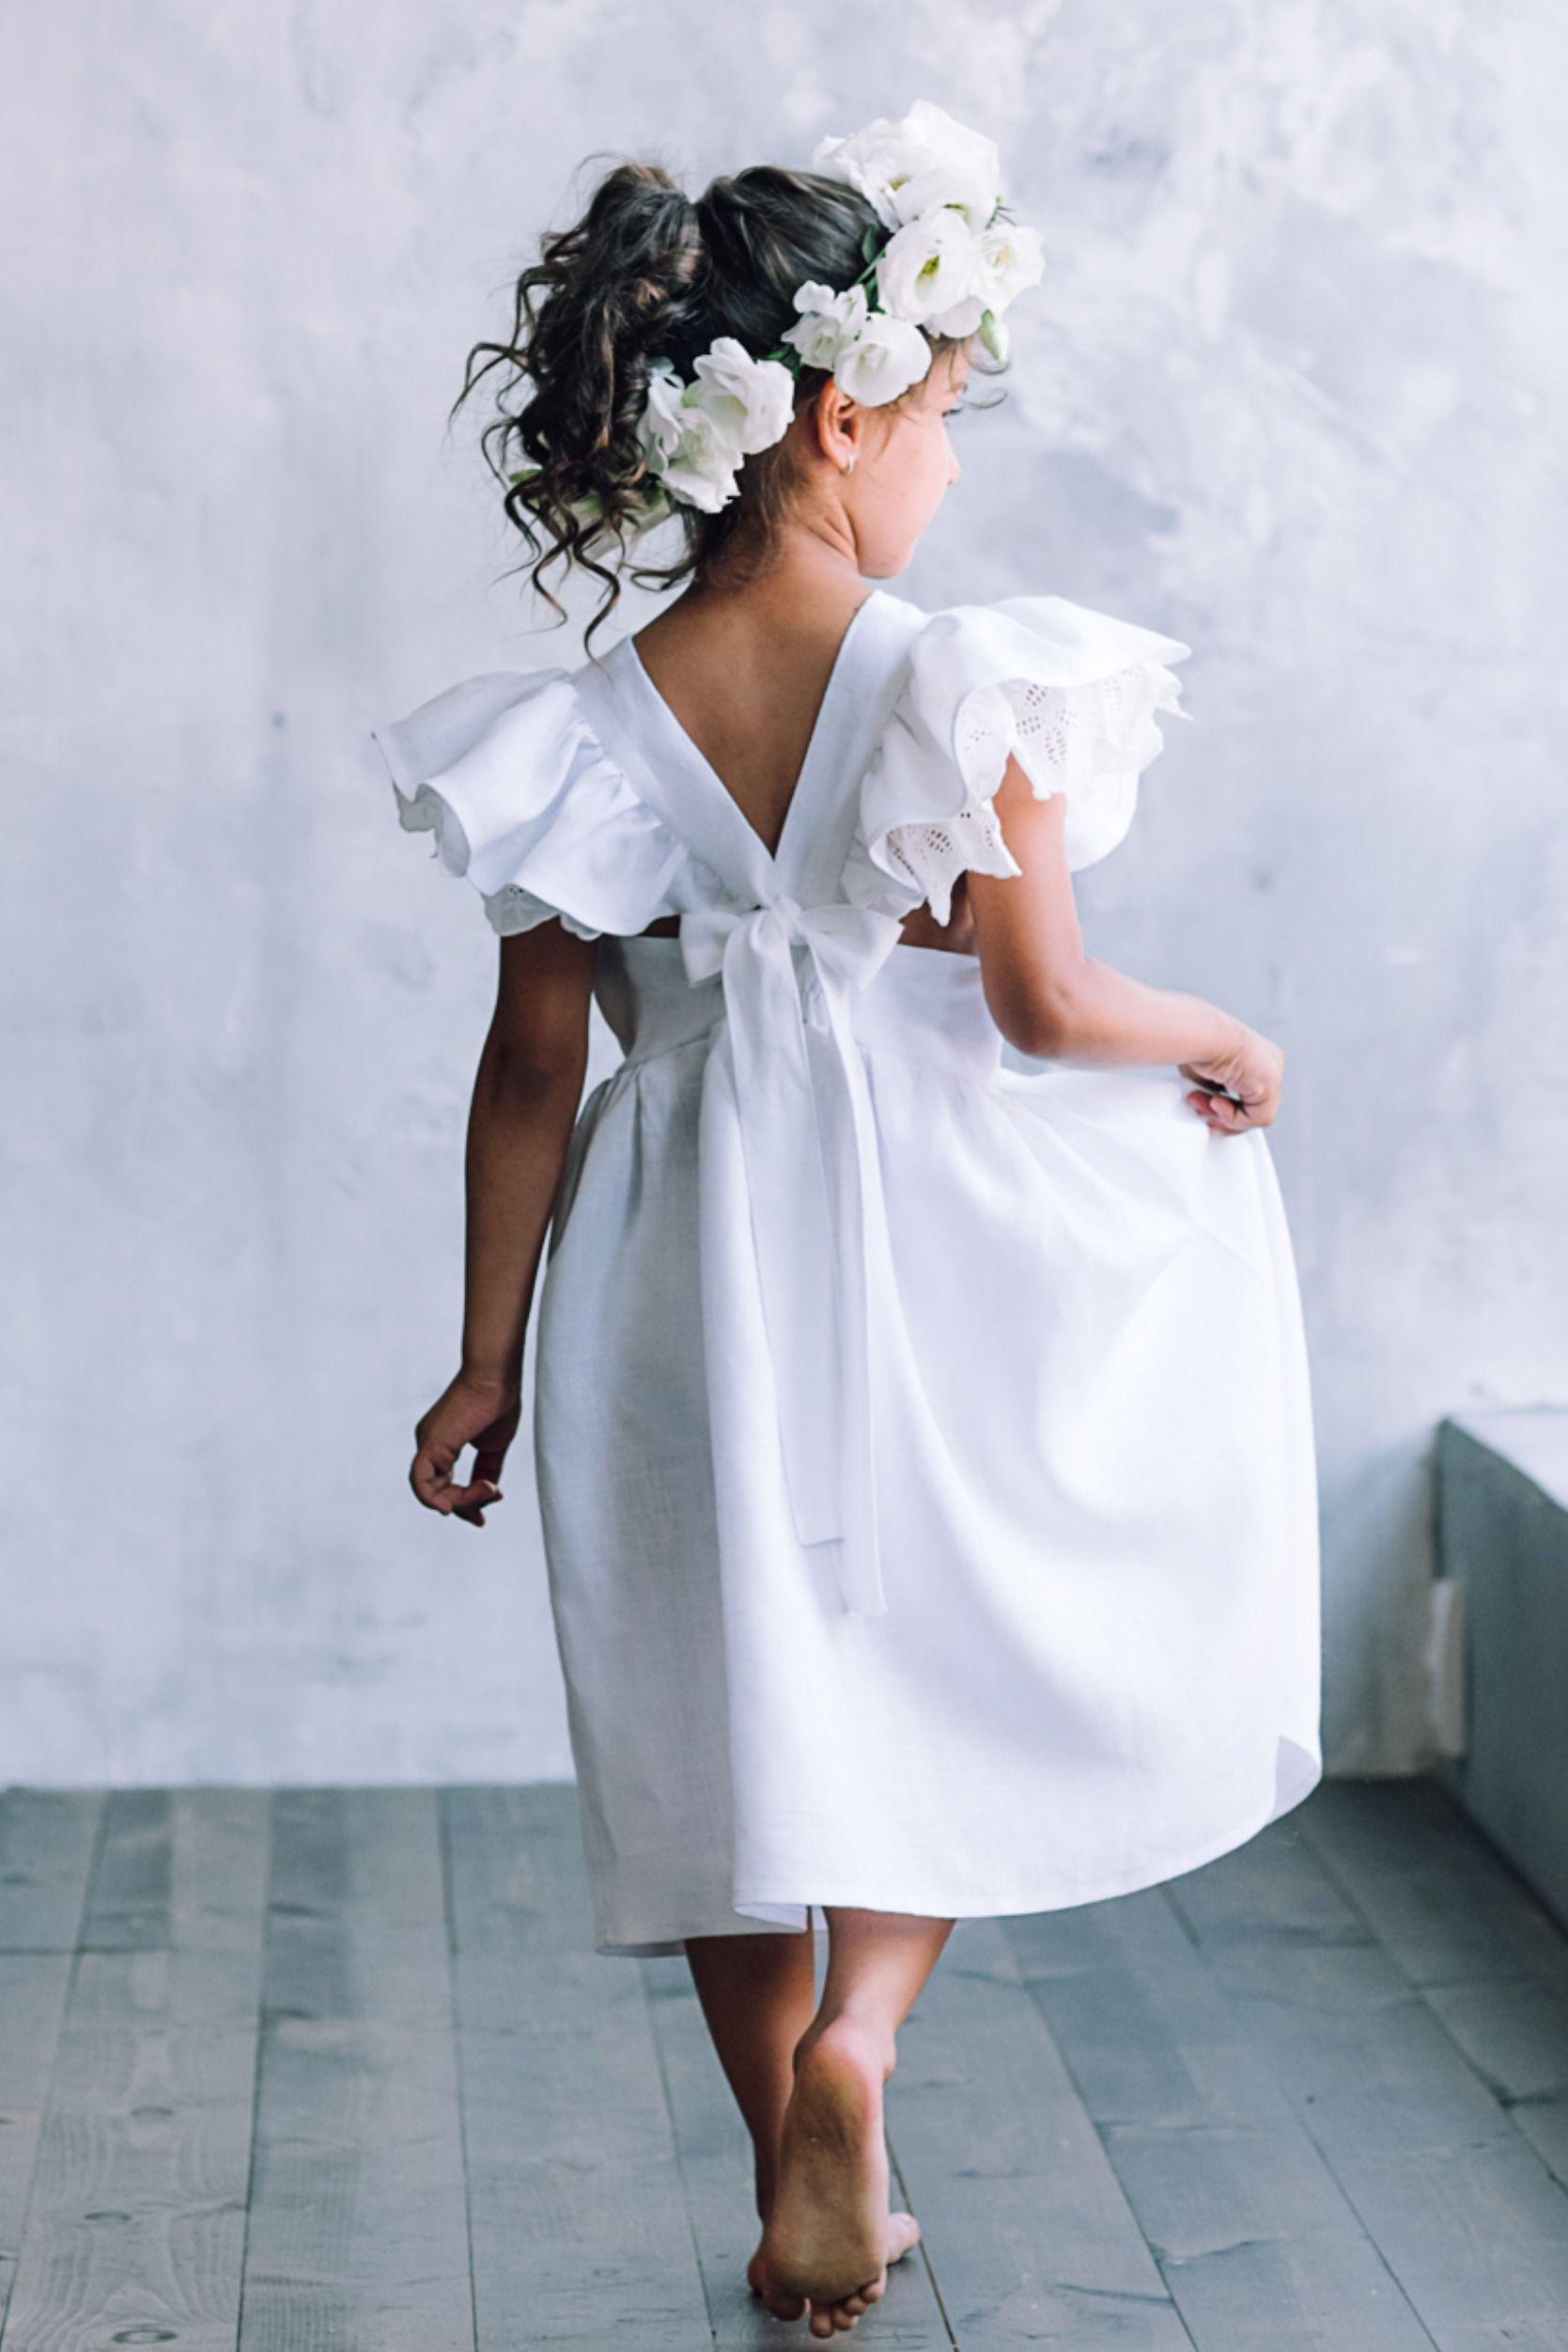 Baptism dress toddler, Christening dress, Boho dress for girls, Girls linen dress, Girls pinafore